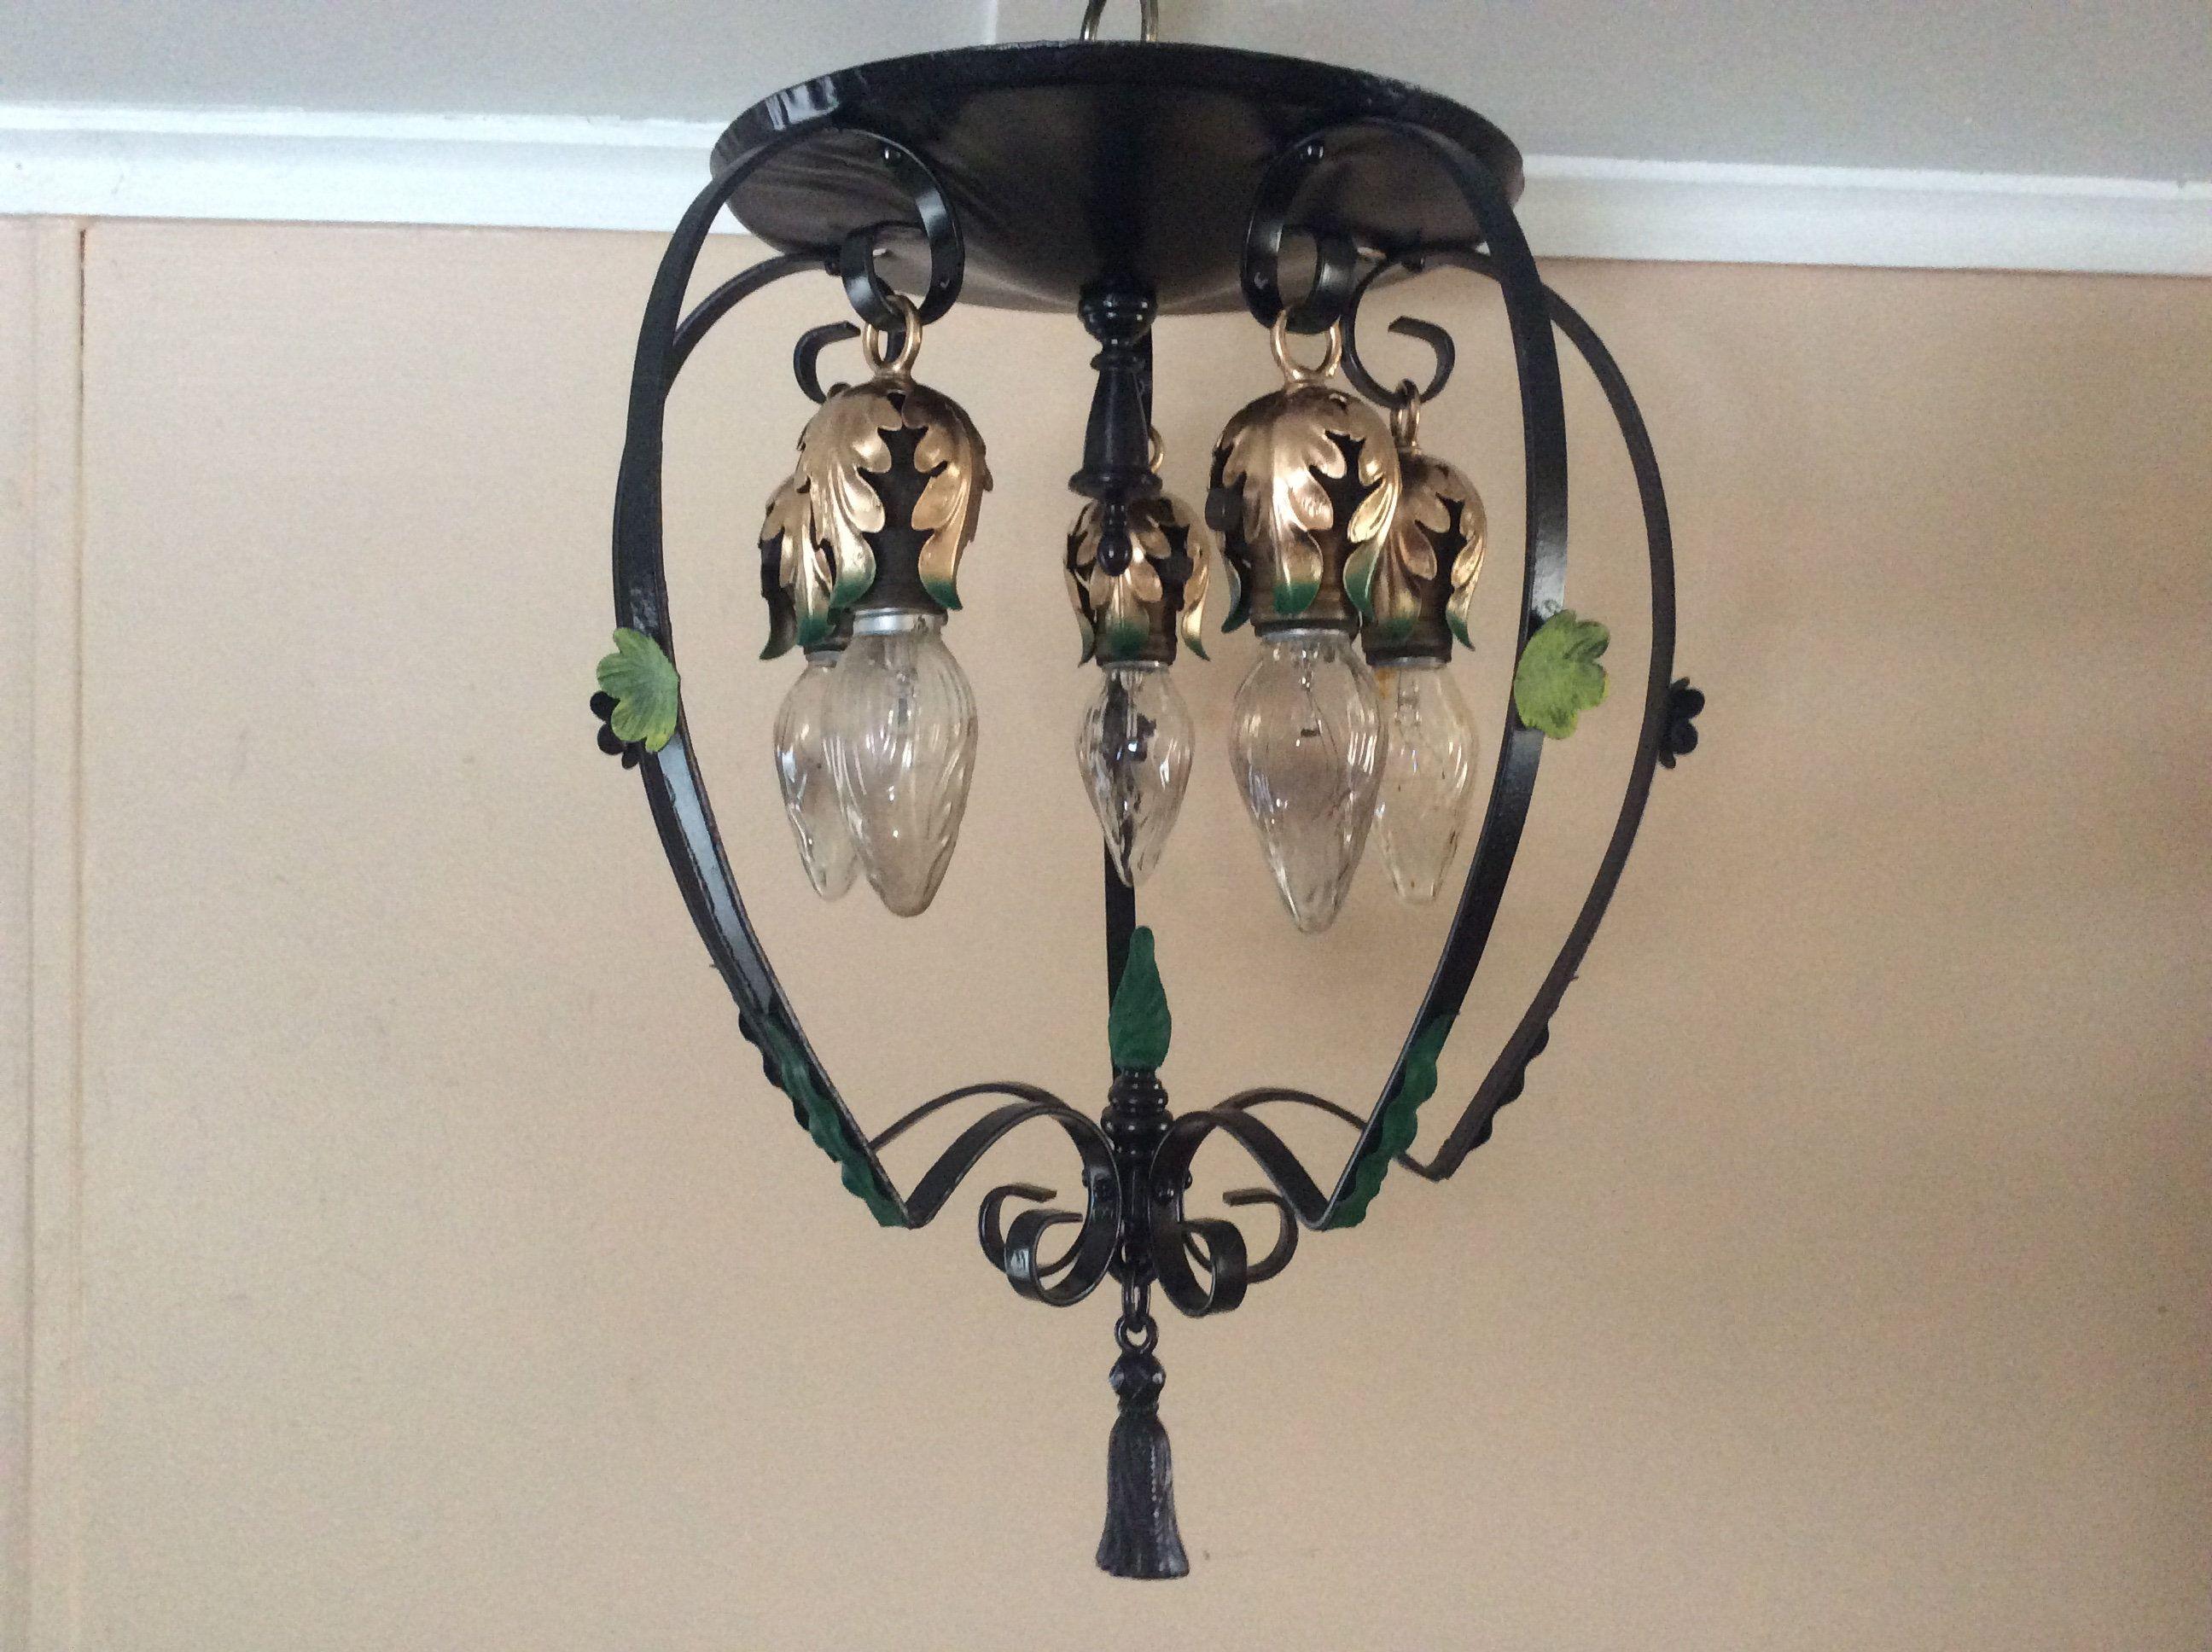 spanish revival lighting. Antique Large Ceiling Light Fixture Wrought Iron 1940s Spanish Revival Lighting S